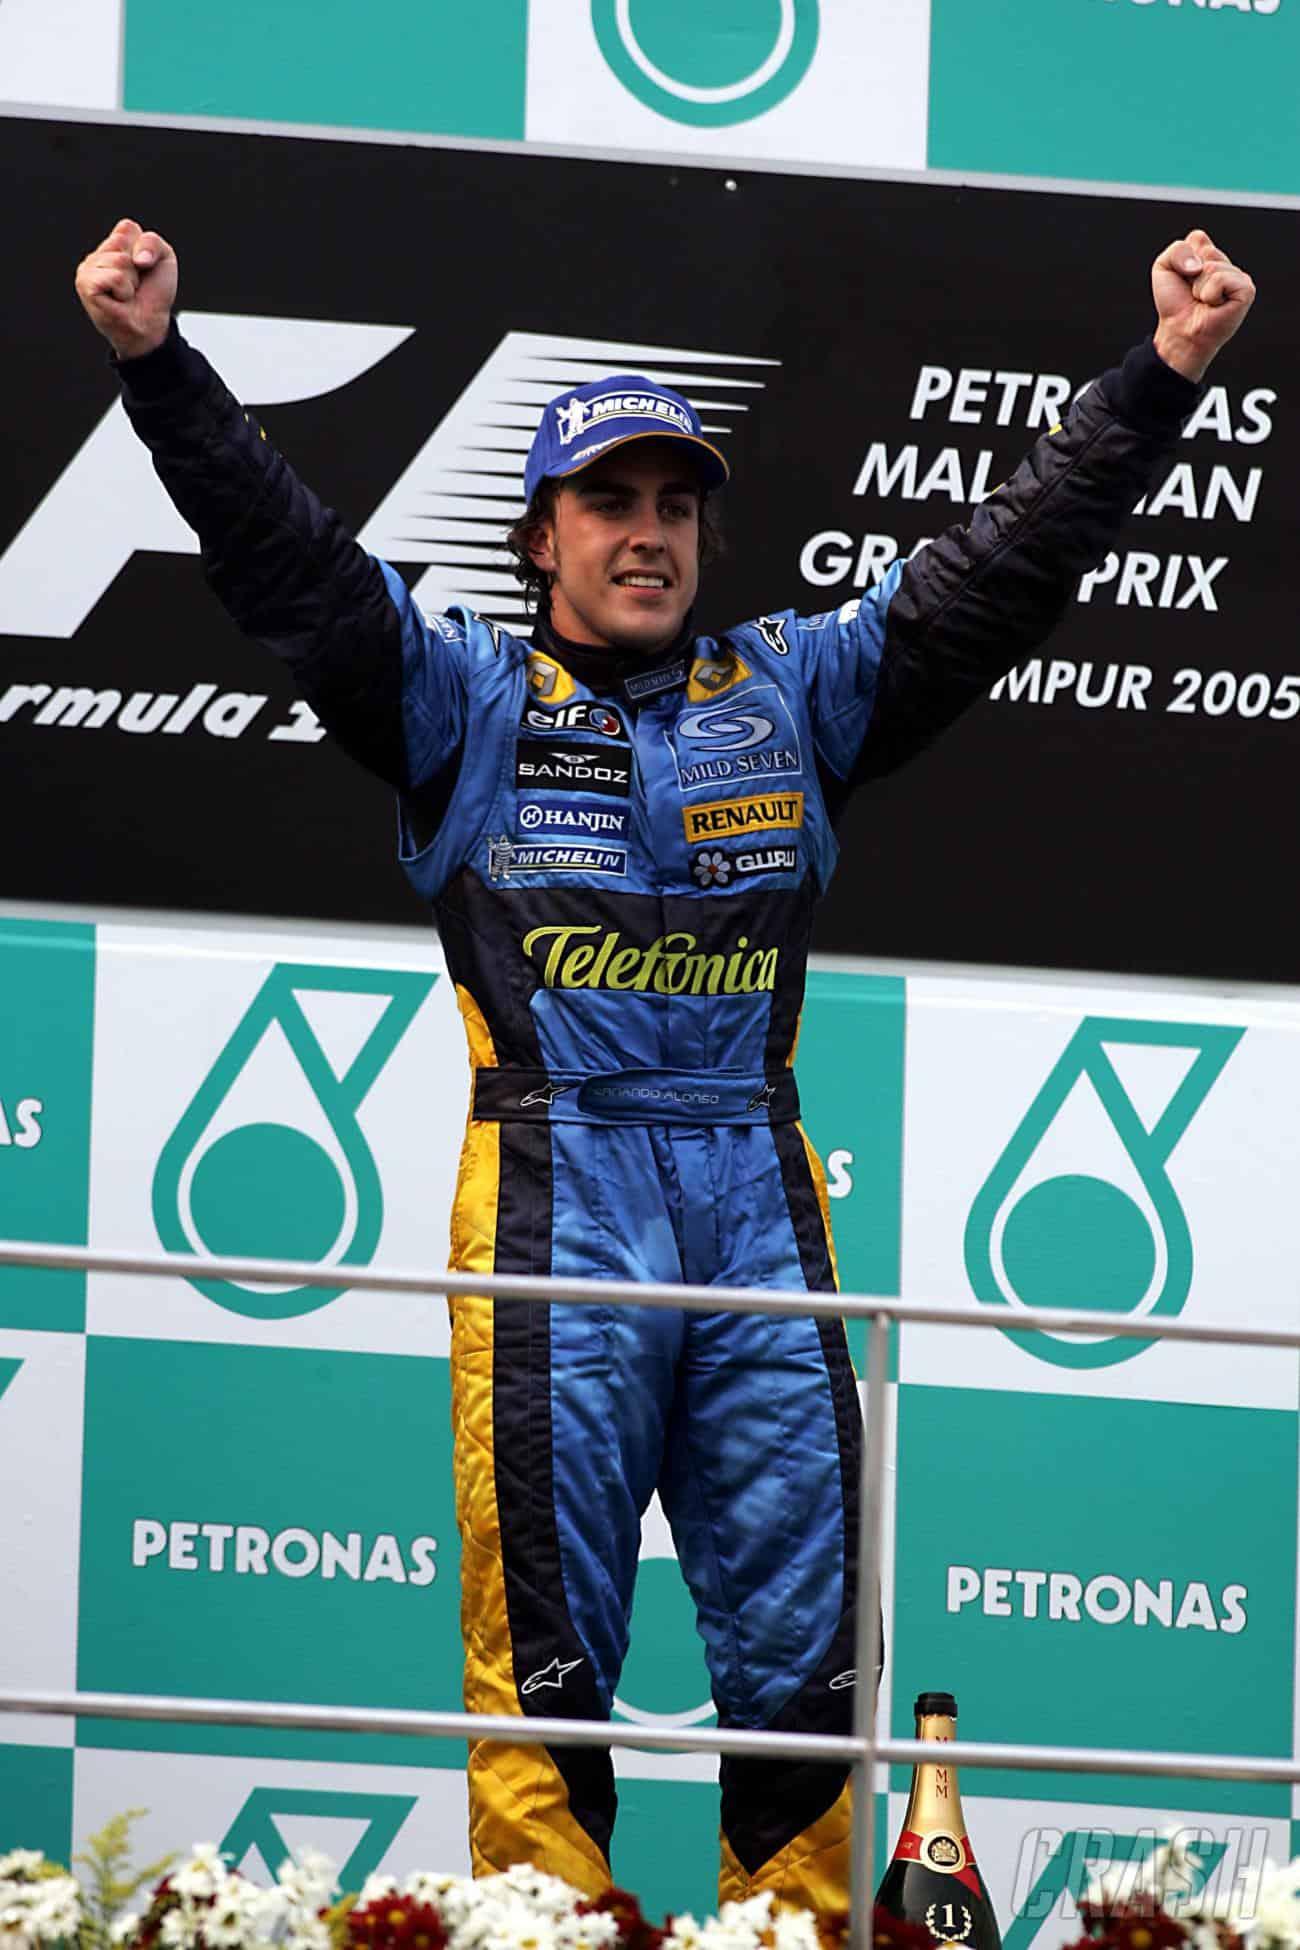 2005 Malaysian GP F1 Fernando Alonso celebrate on the podium Photo Chrash-net